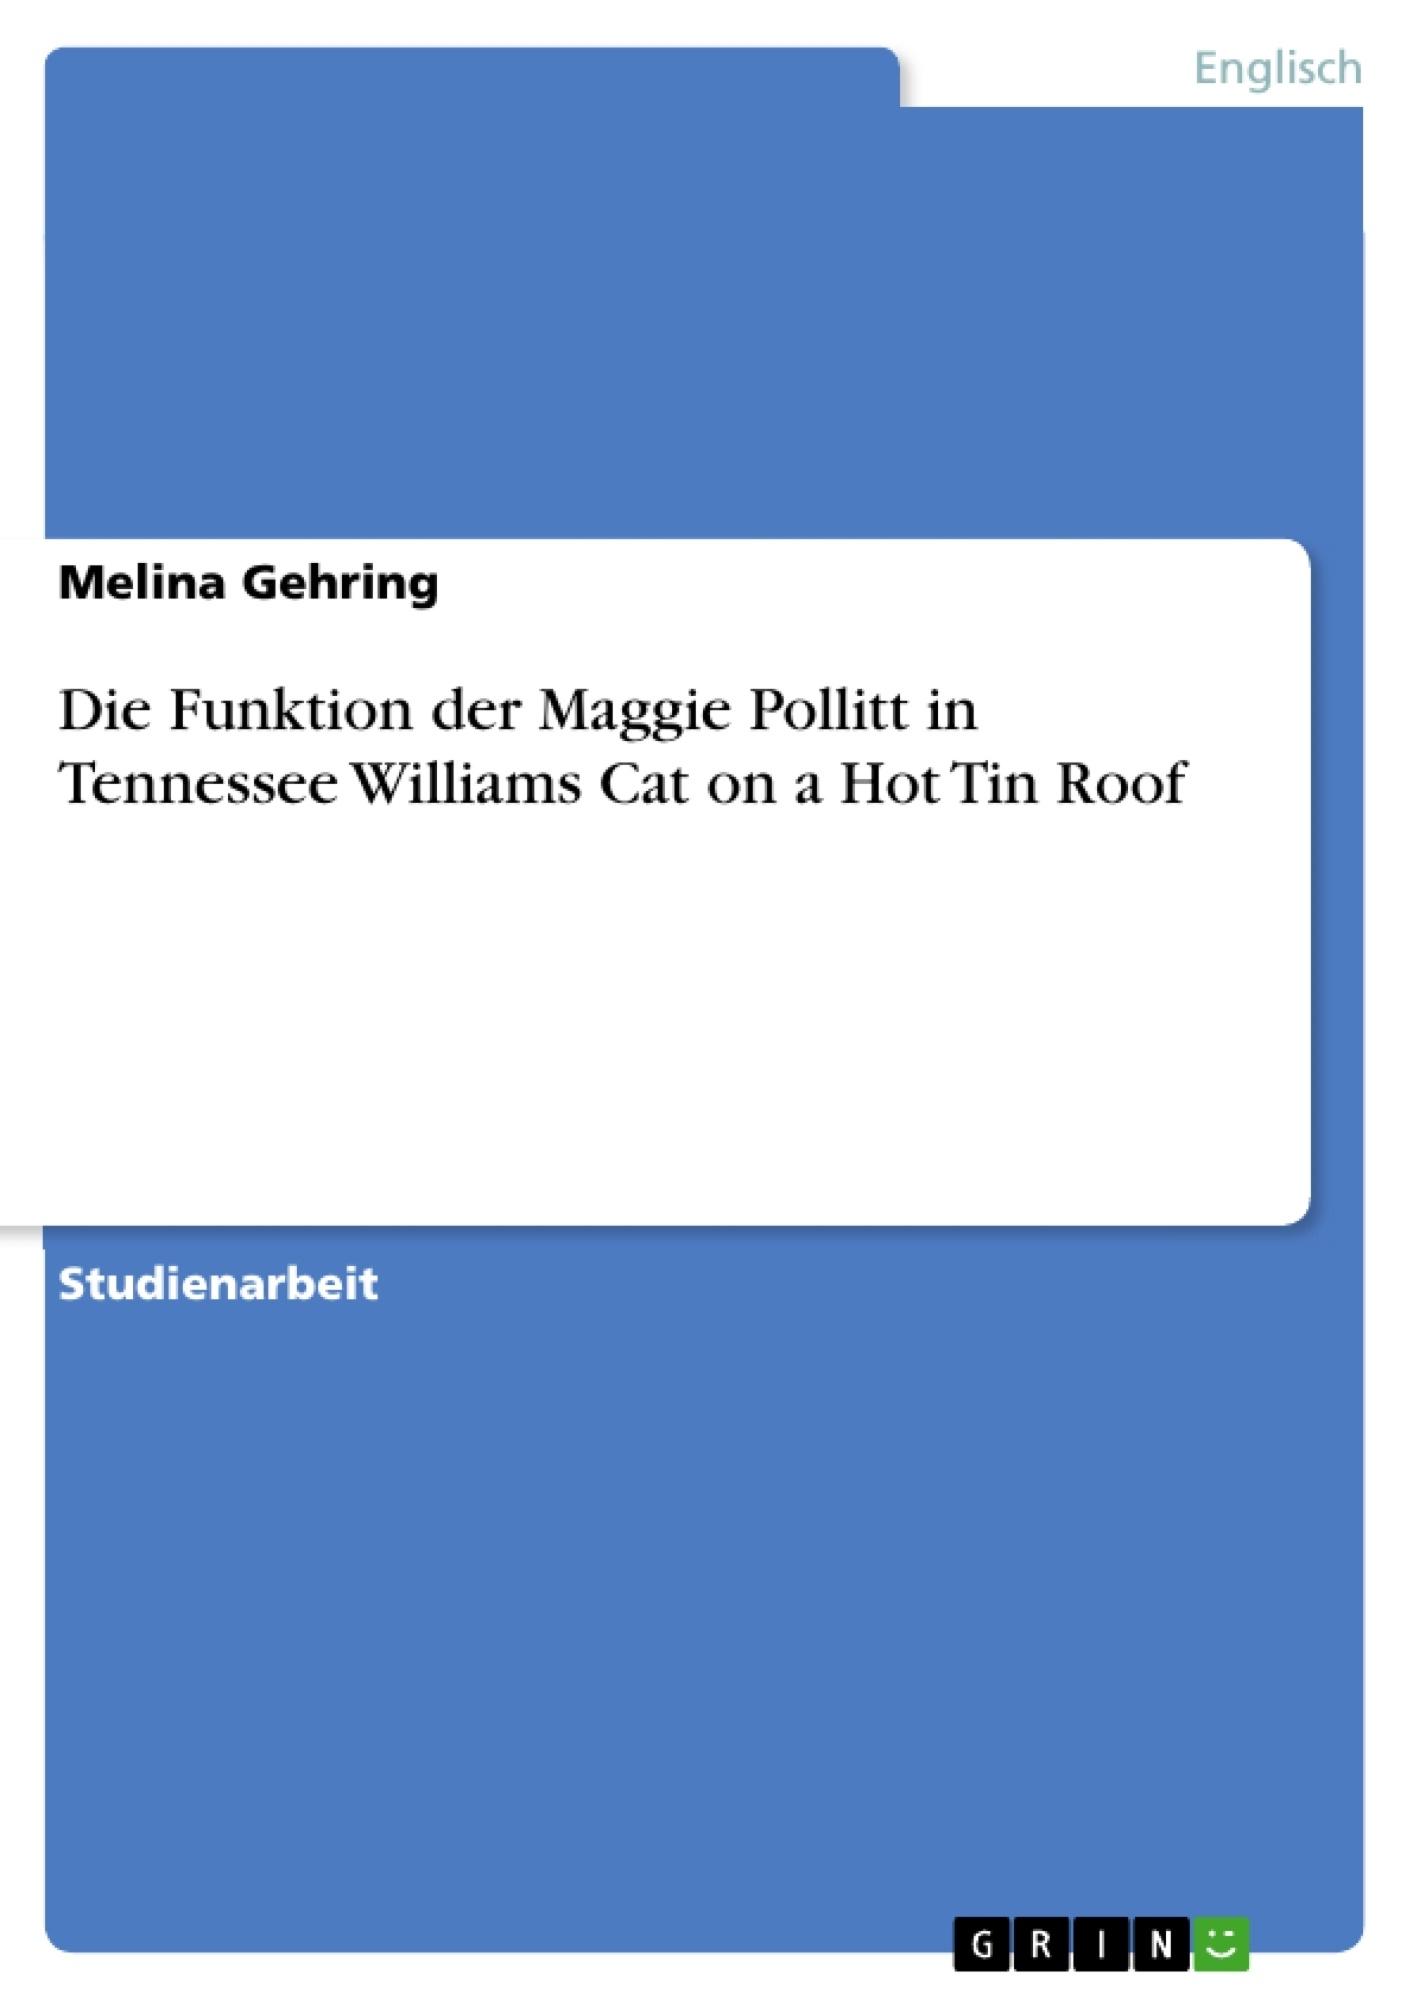 Titel: Die Funktion der Maggie Pollitt in Tennessee Williams Cat on a Hot Tin Roof